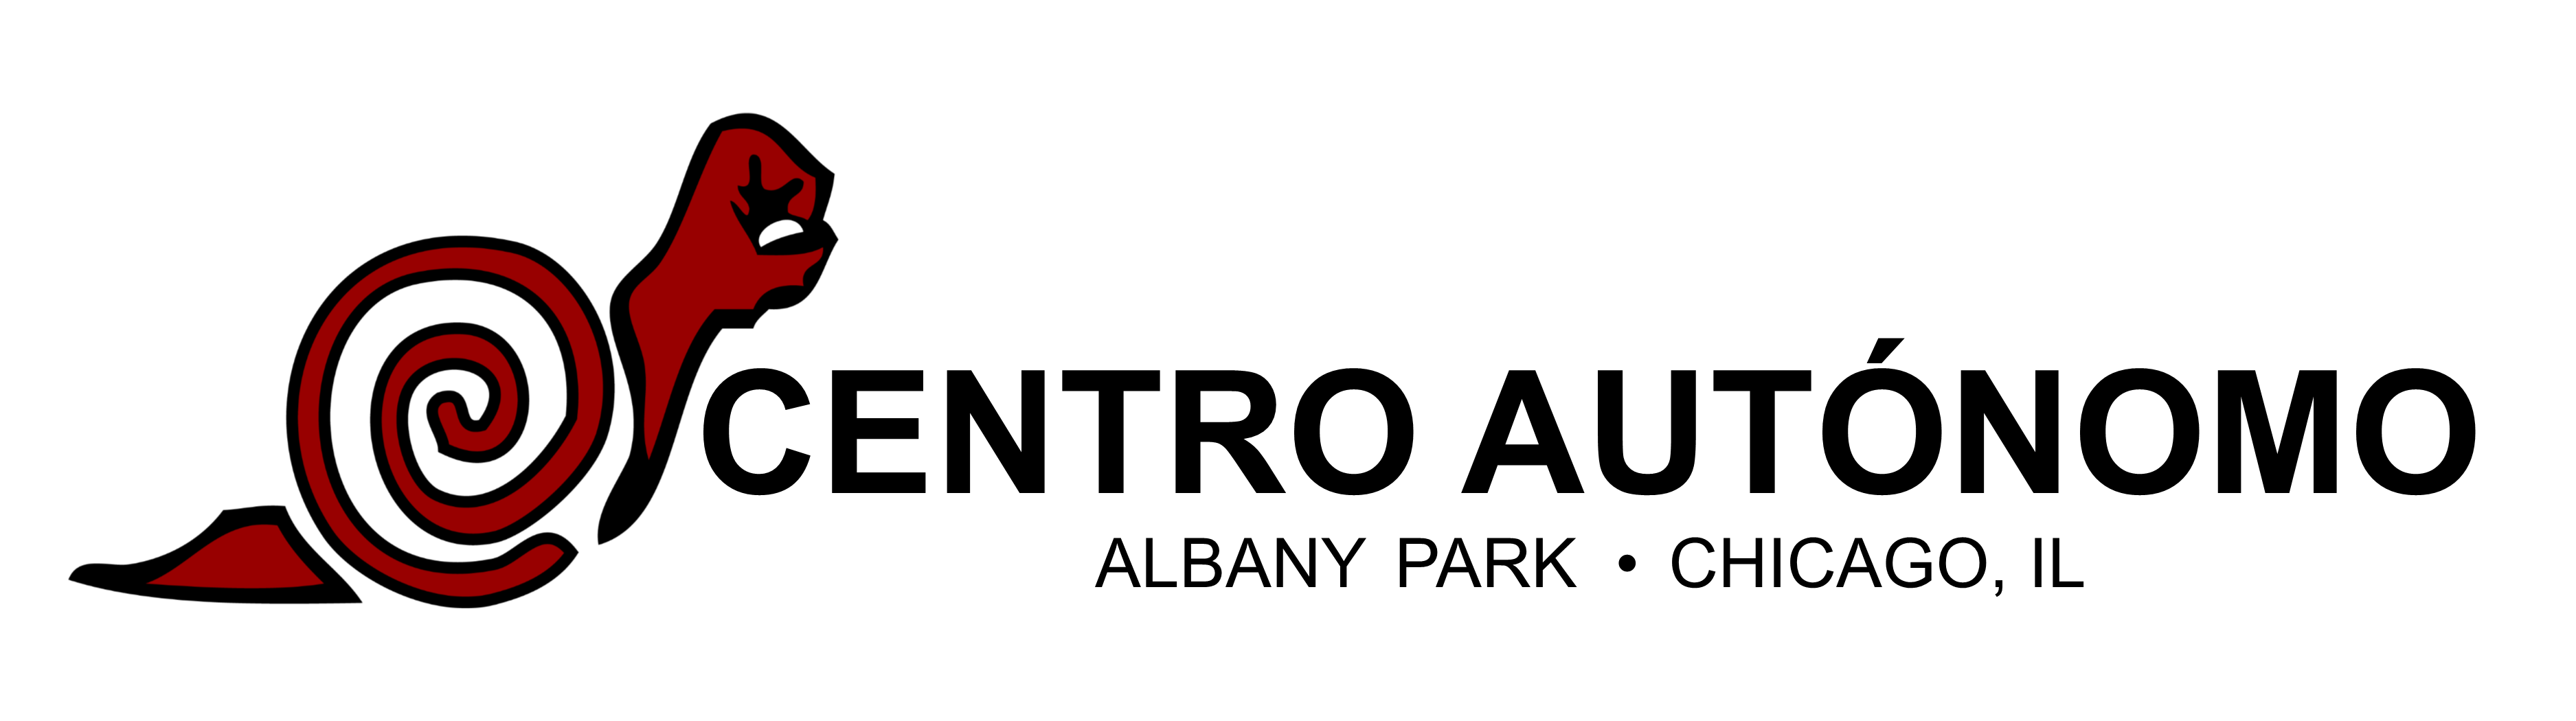 Centro Autónomo